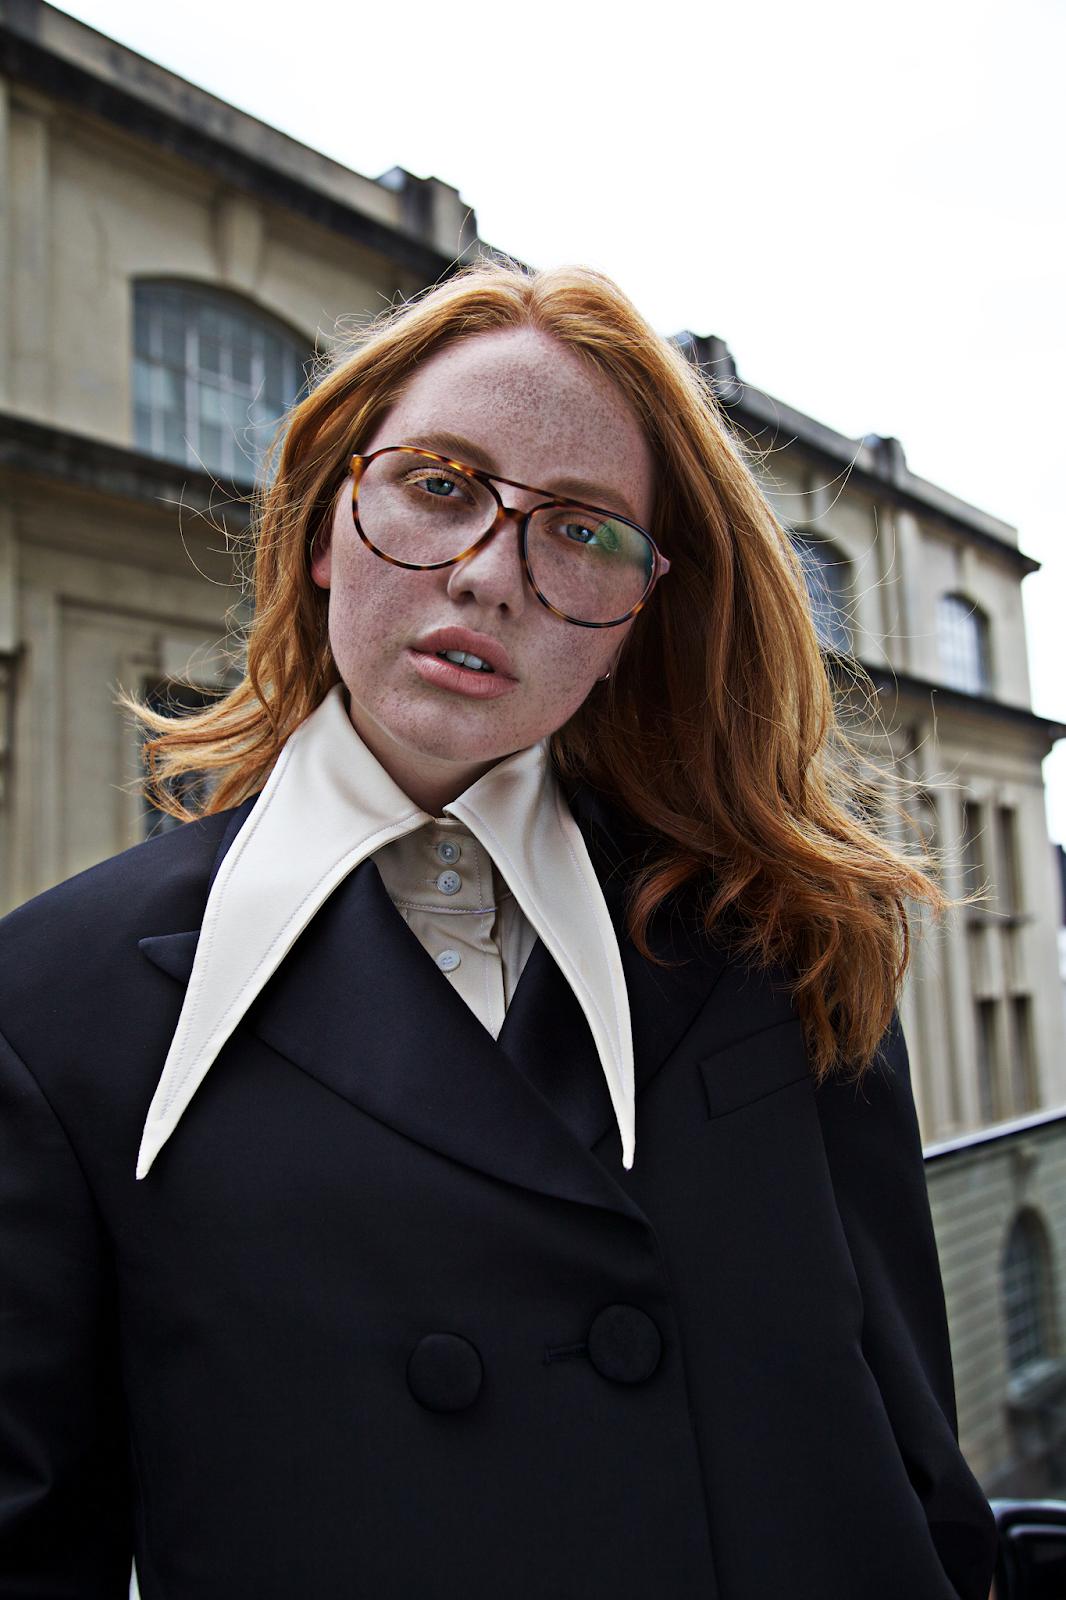 Ellery x Specsavers Nicole Ku | Nicrific